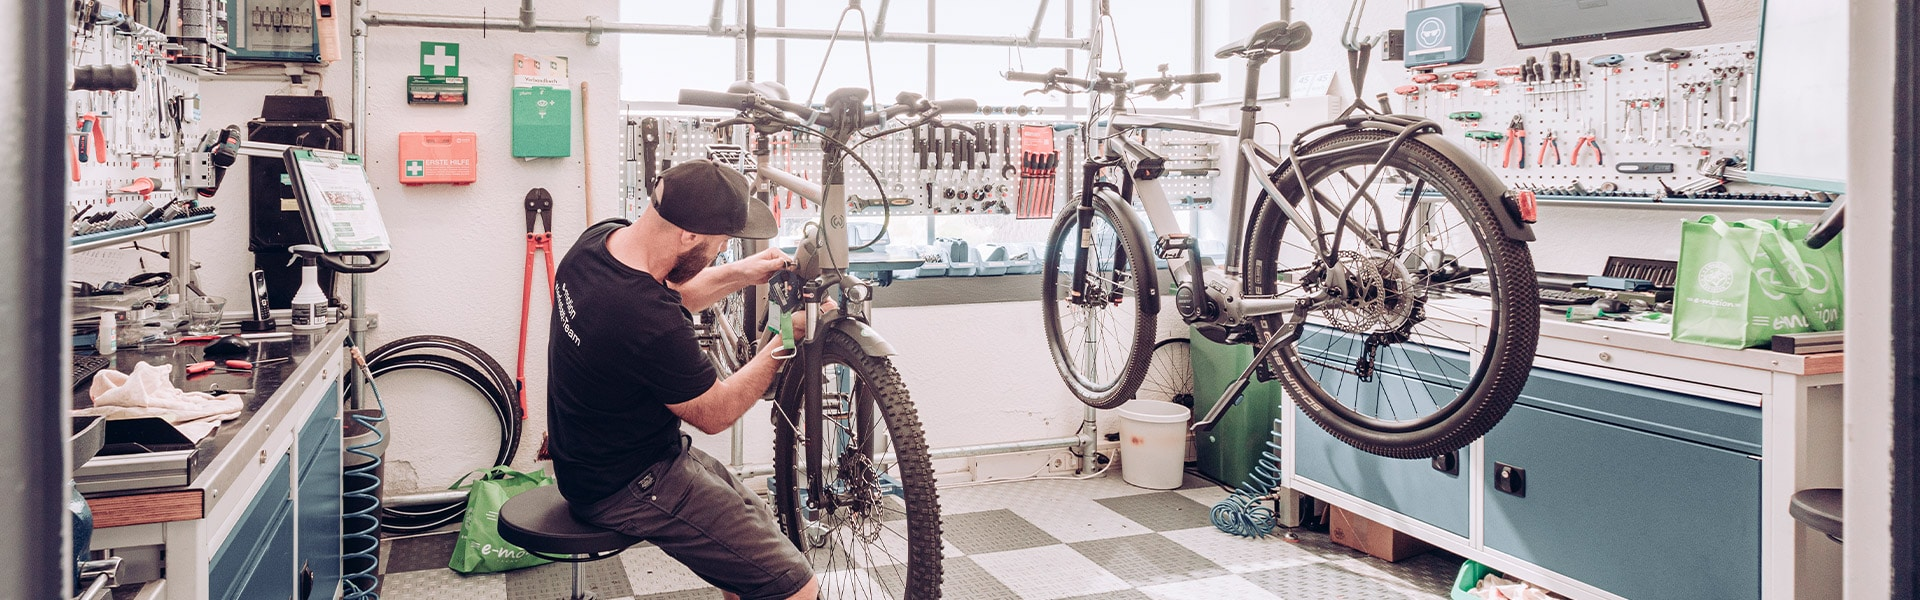 Die Werkstatt der e-motion e-Bike Welt Karlsruhe